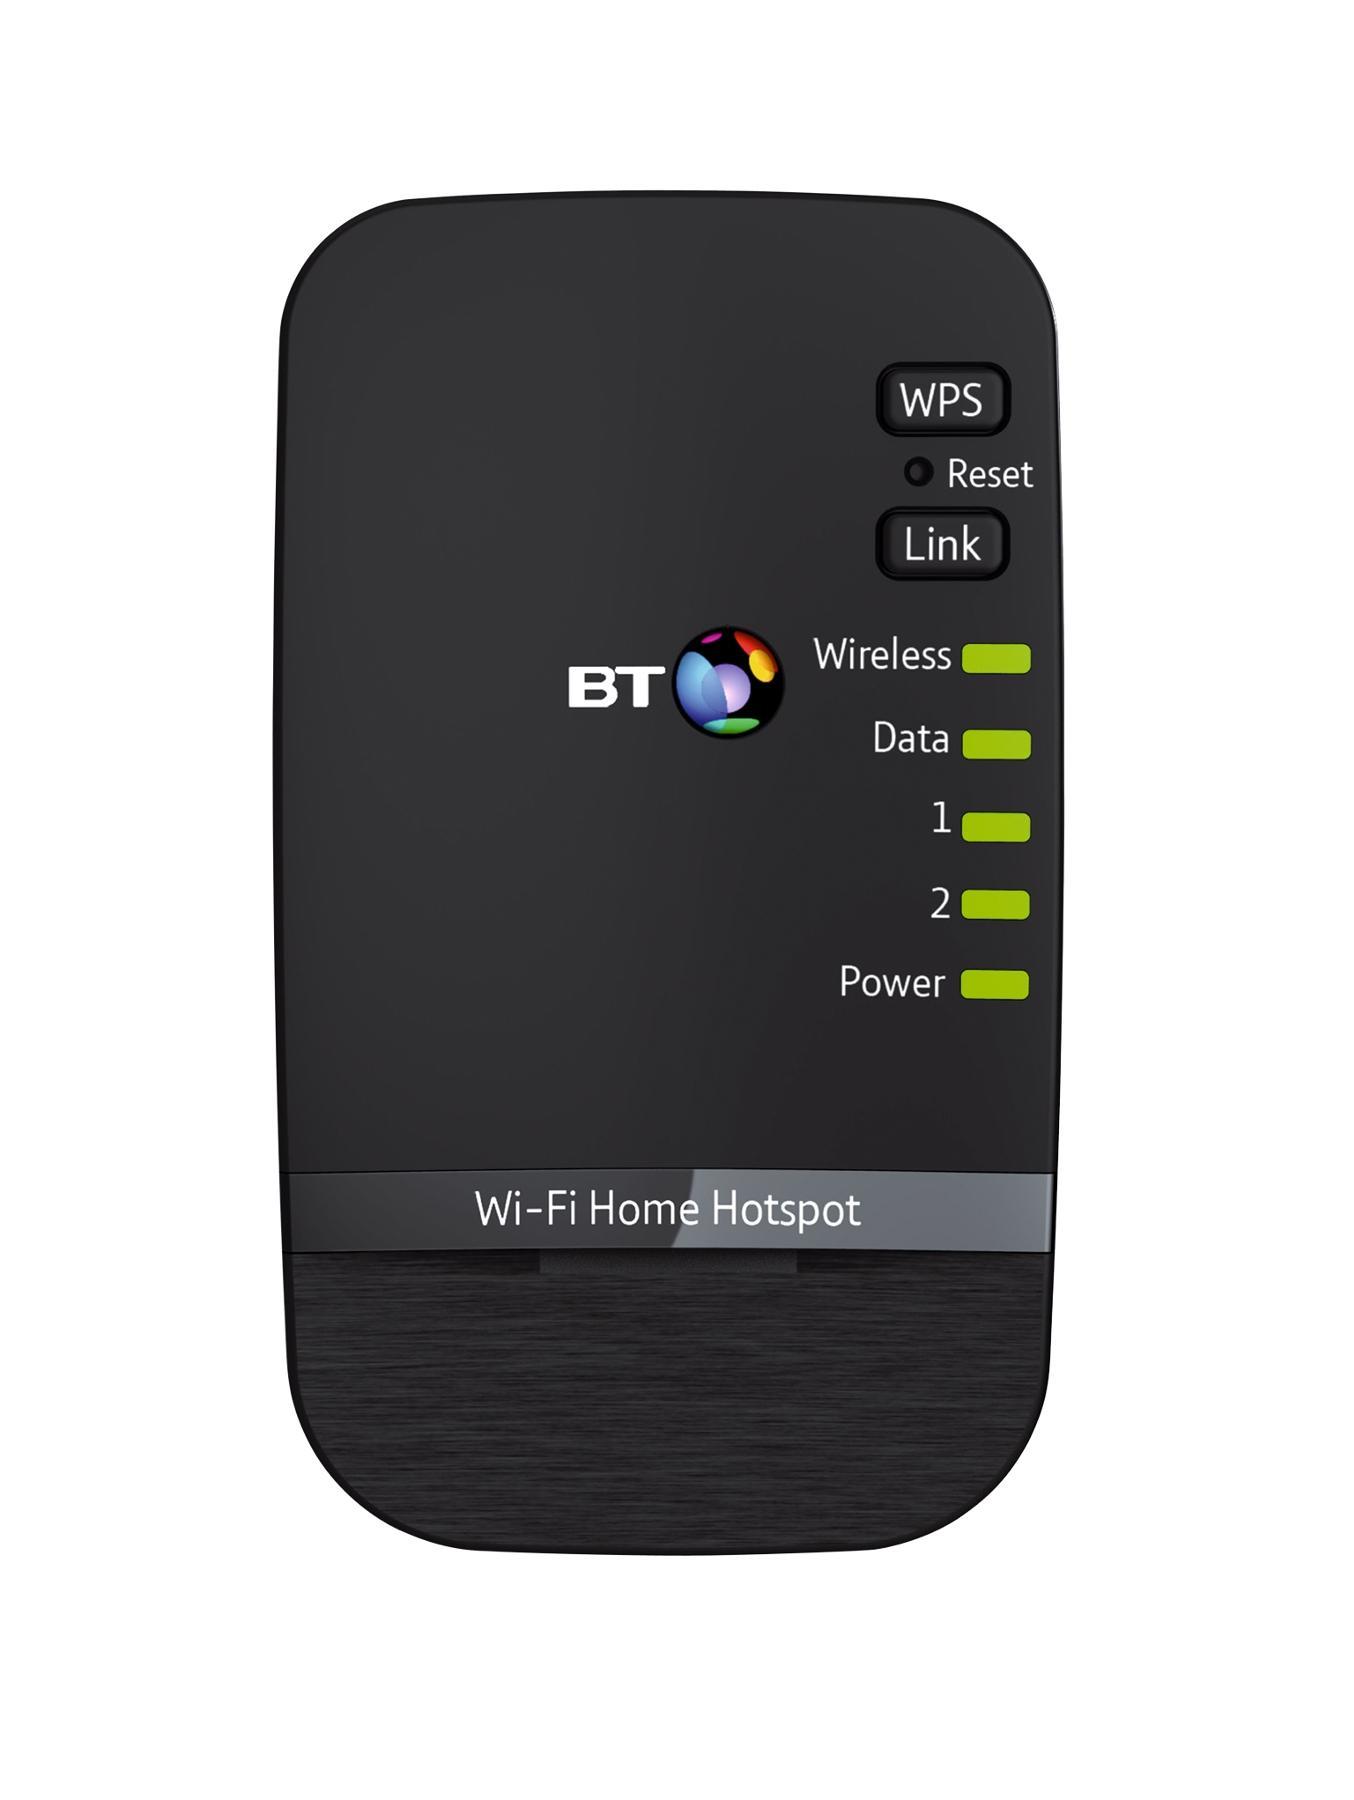 BT Wi-Fi Home Hotspot 500 Add-on - Black